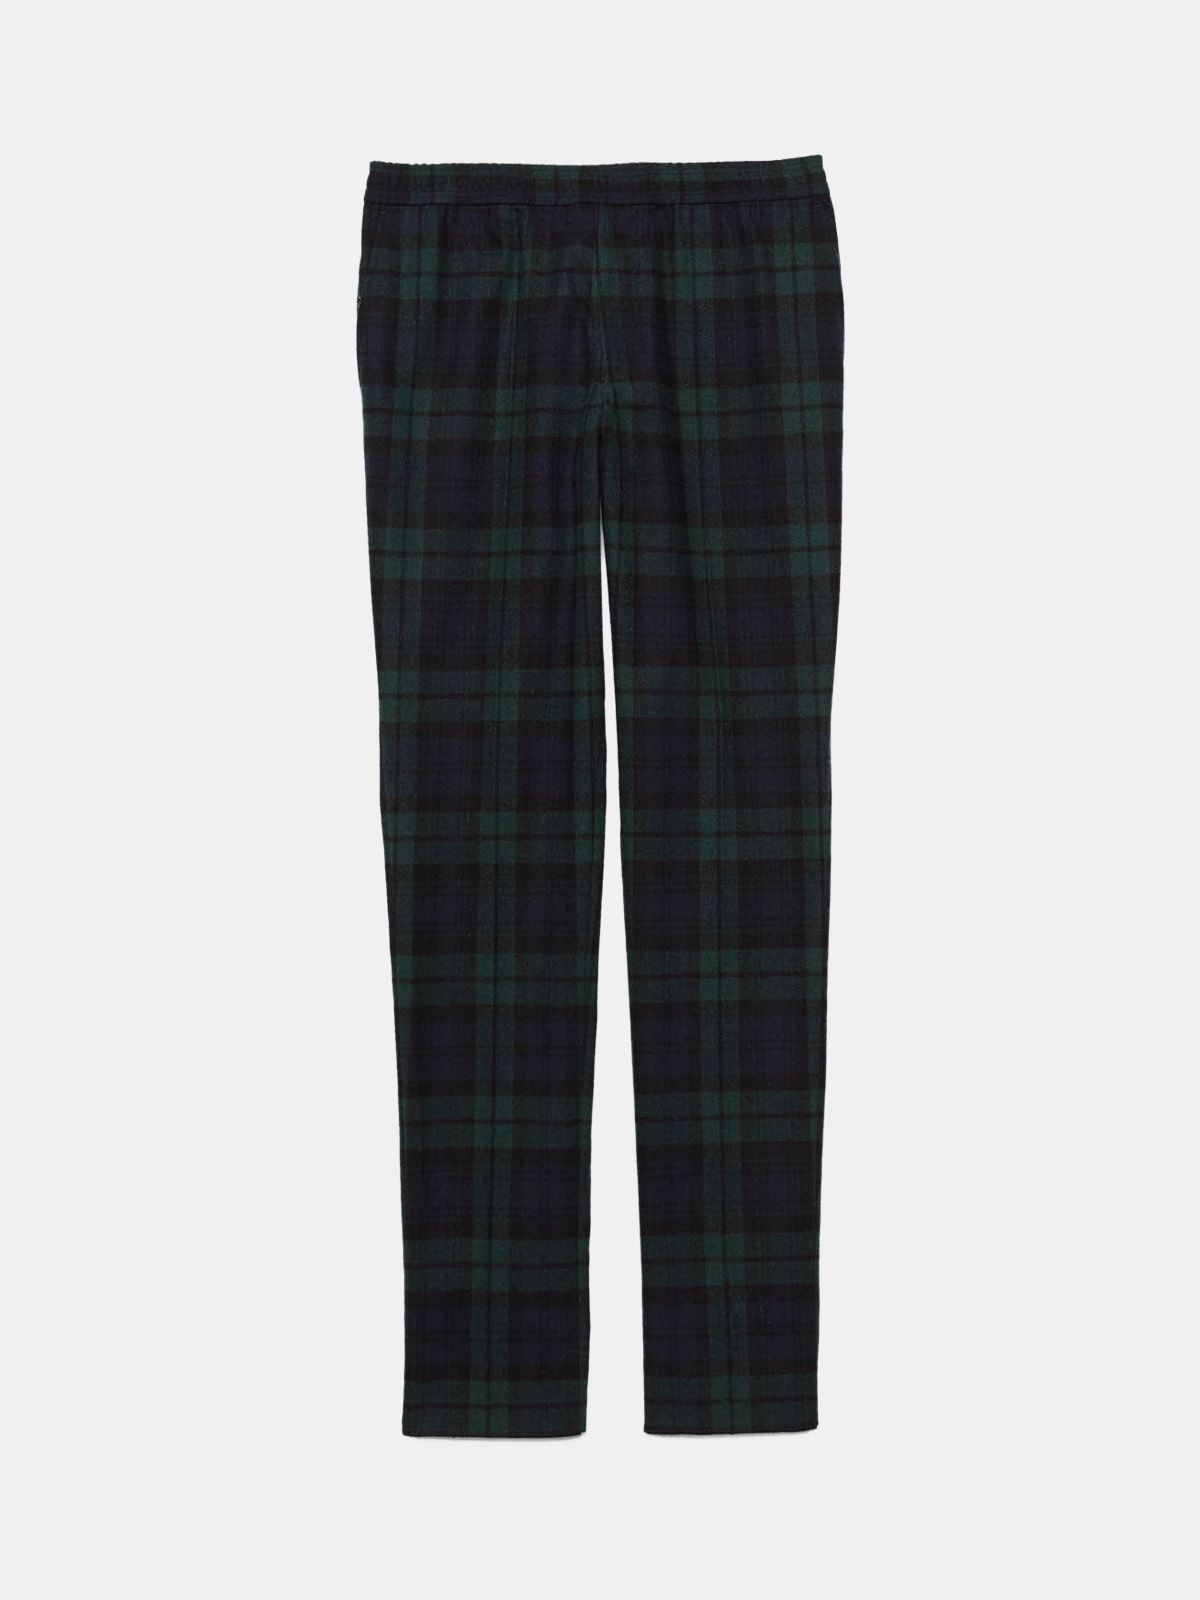 Golden Goose - Ryuu trousers in tartan with elasticated waist in